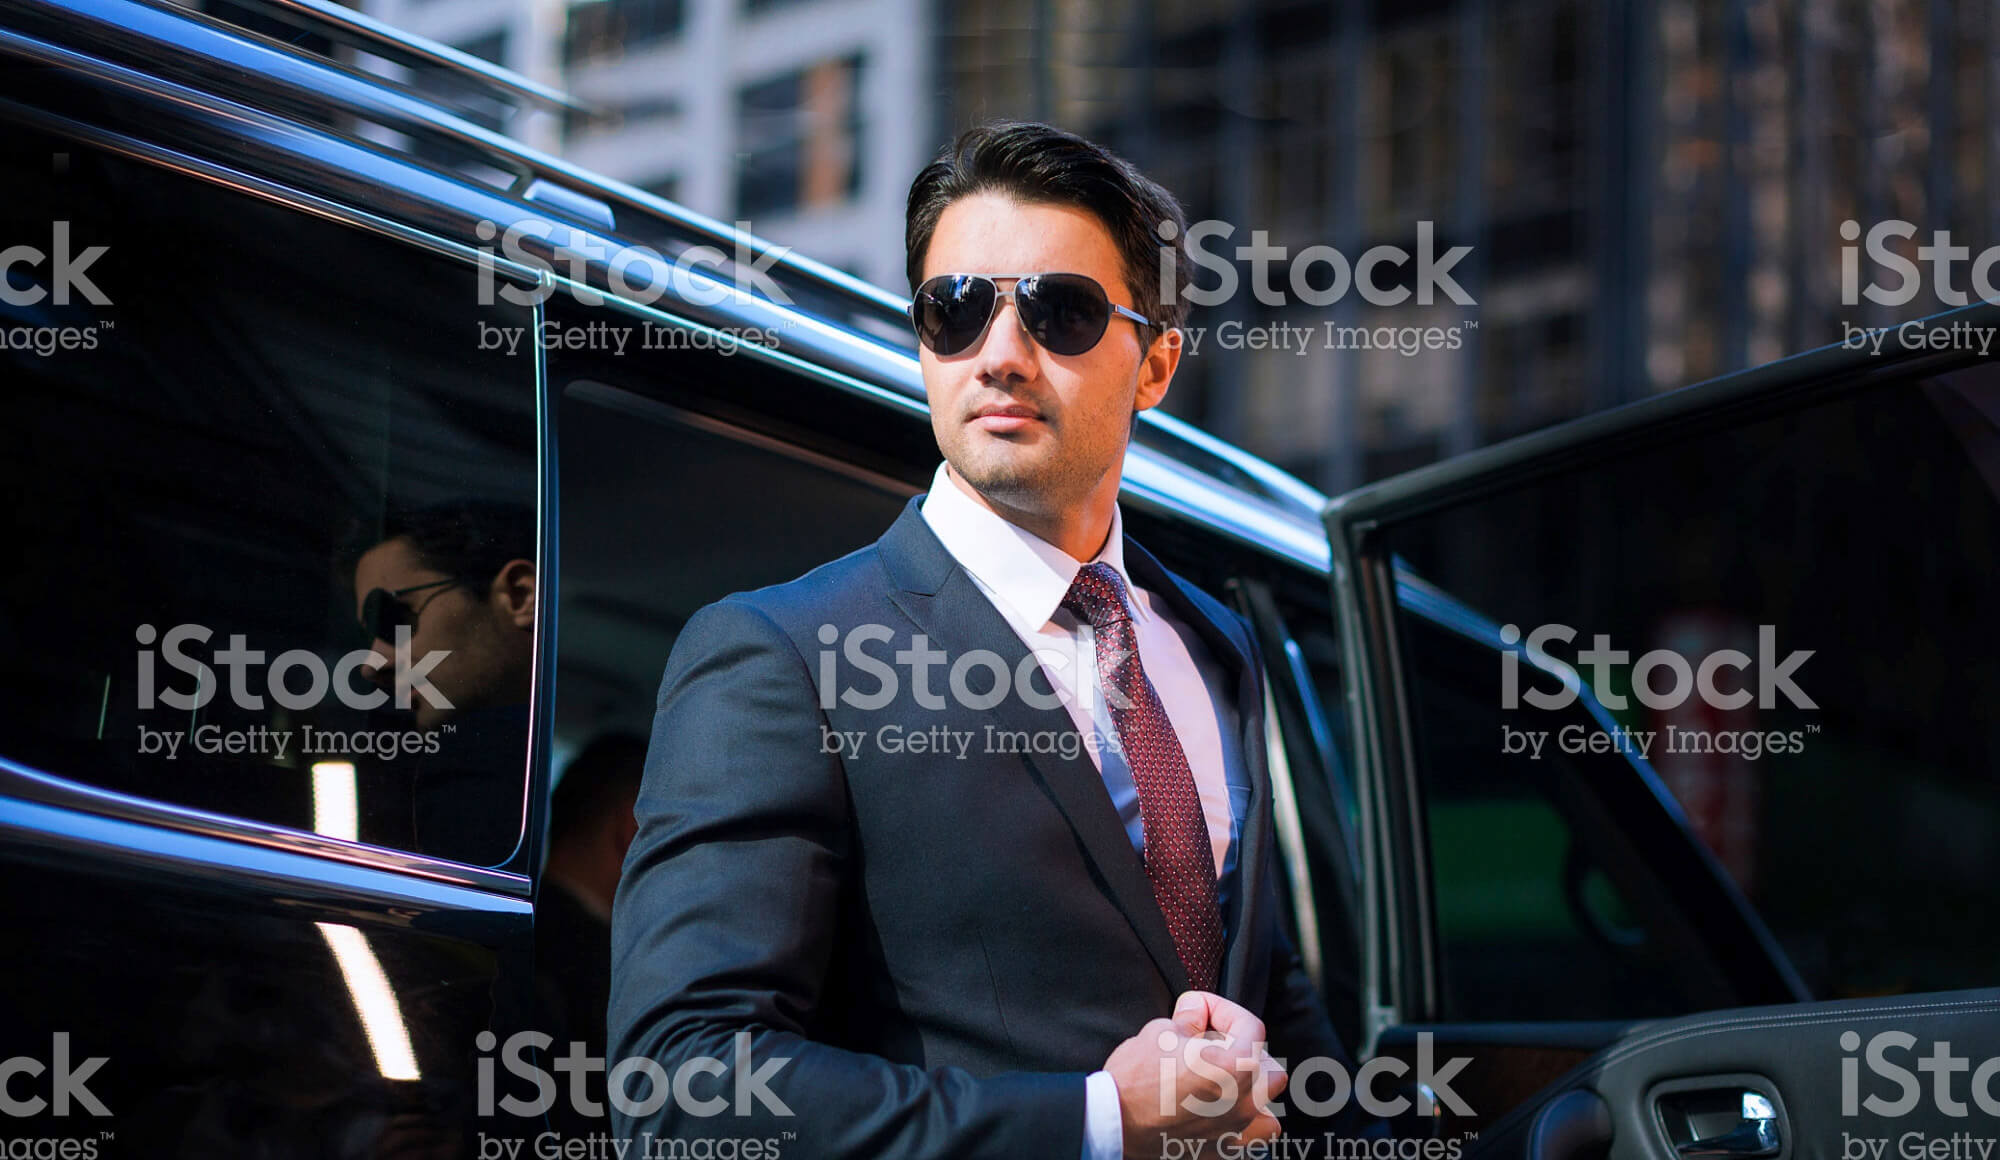 Chauffeuring Loyalty Scheme